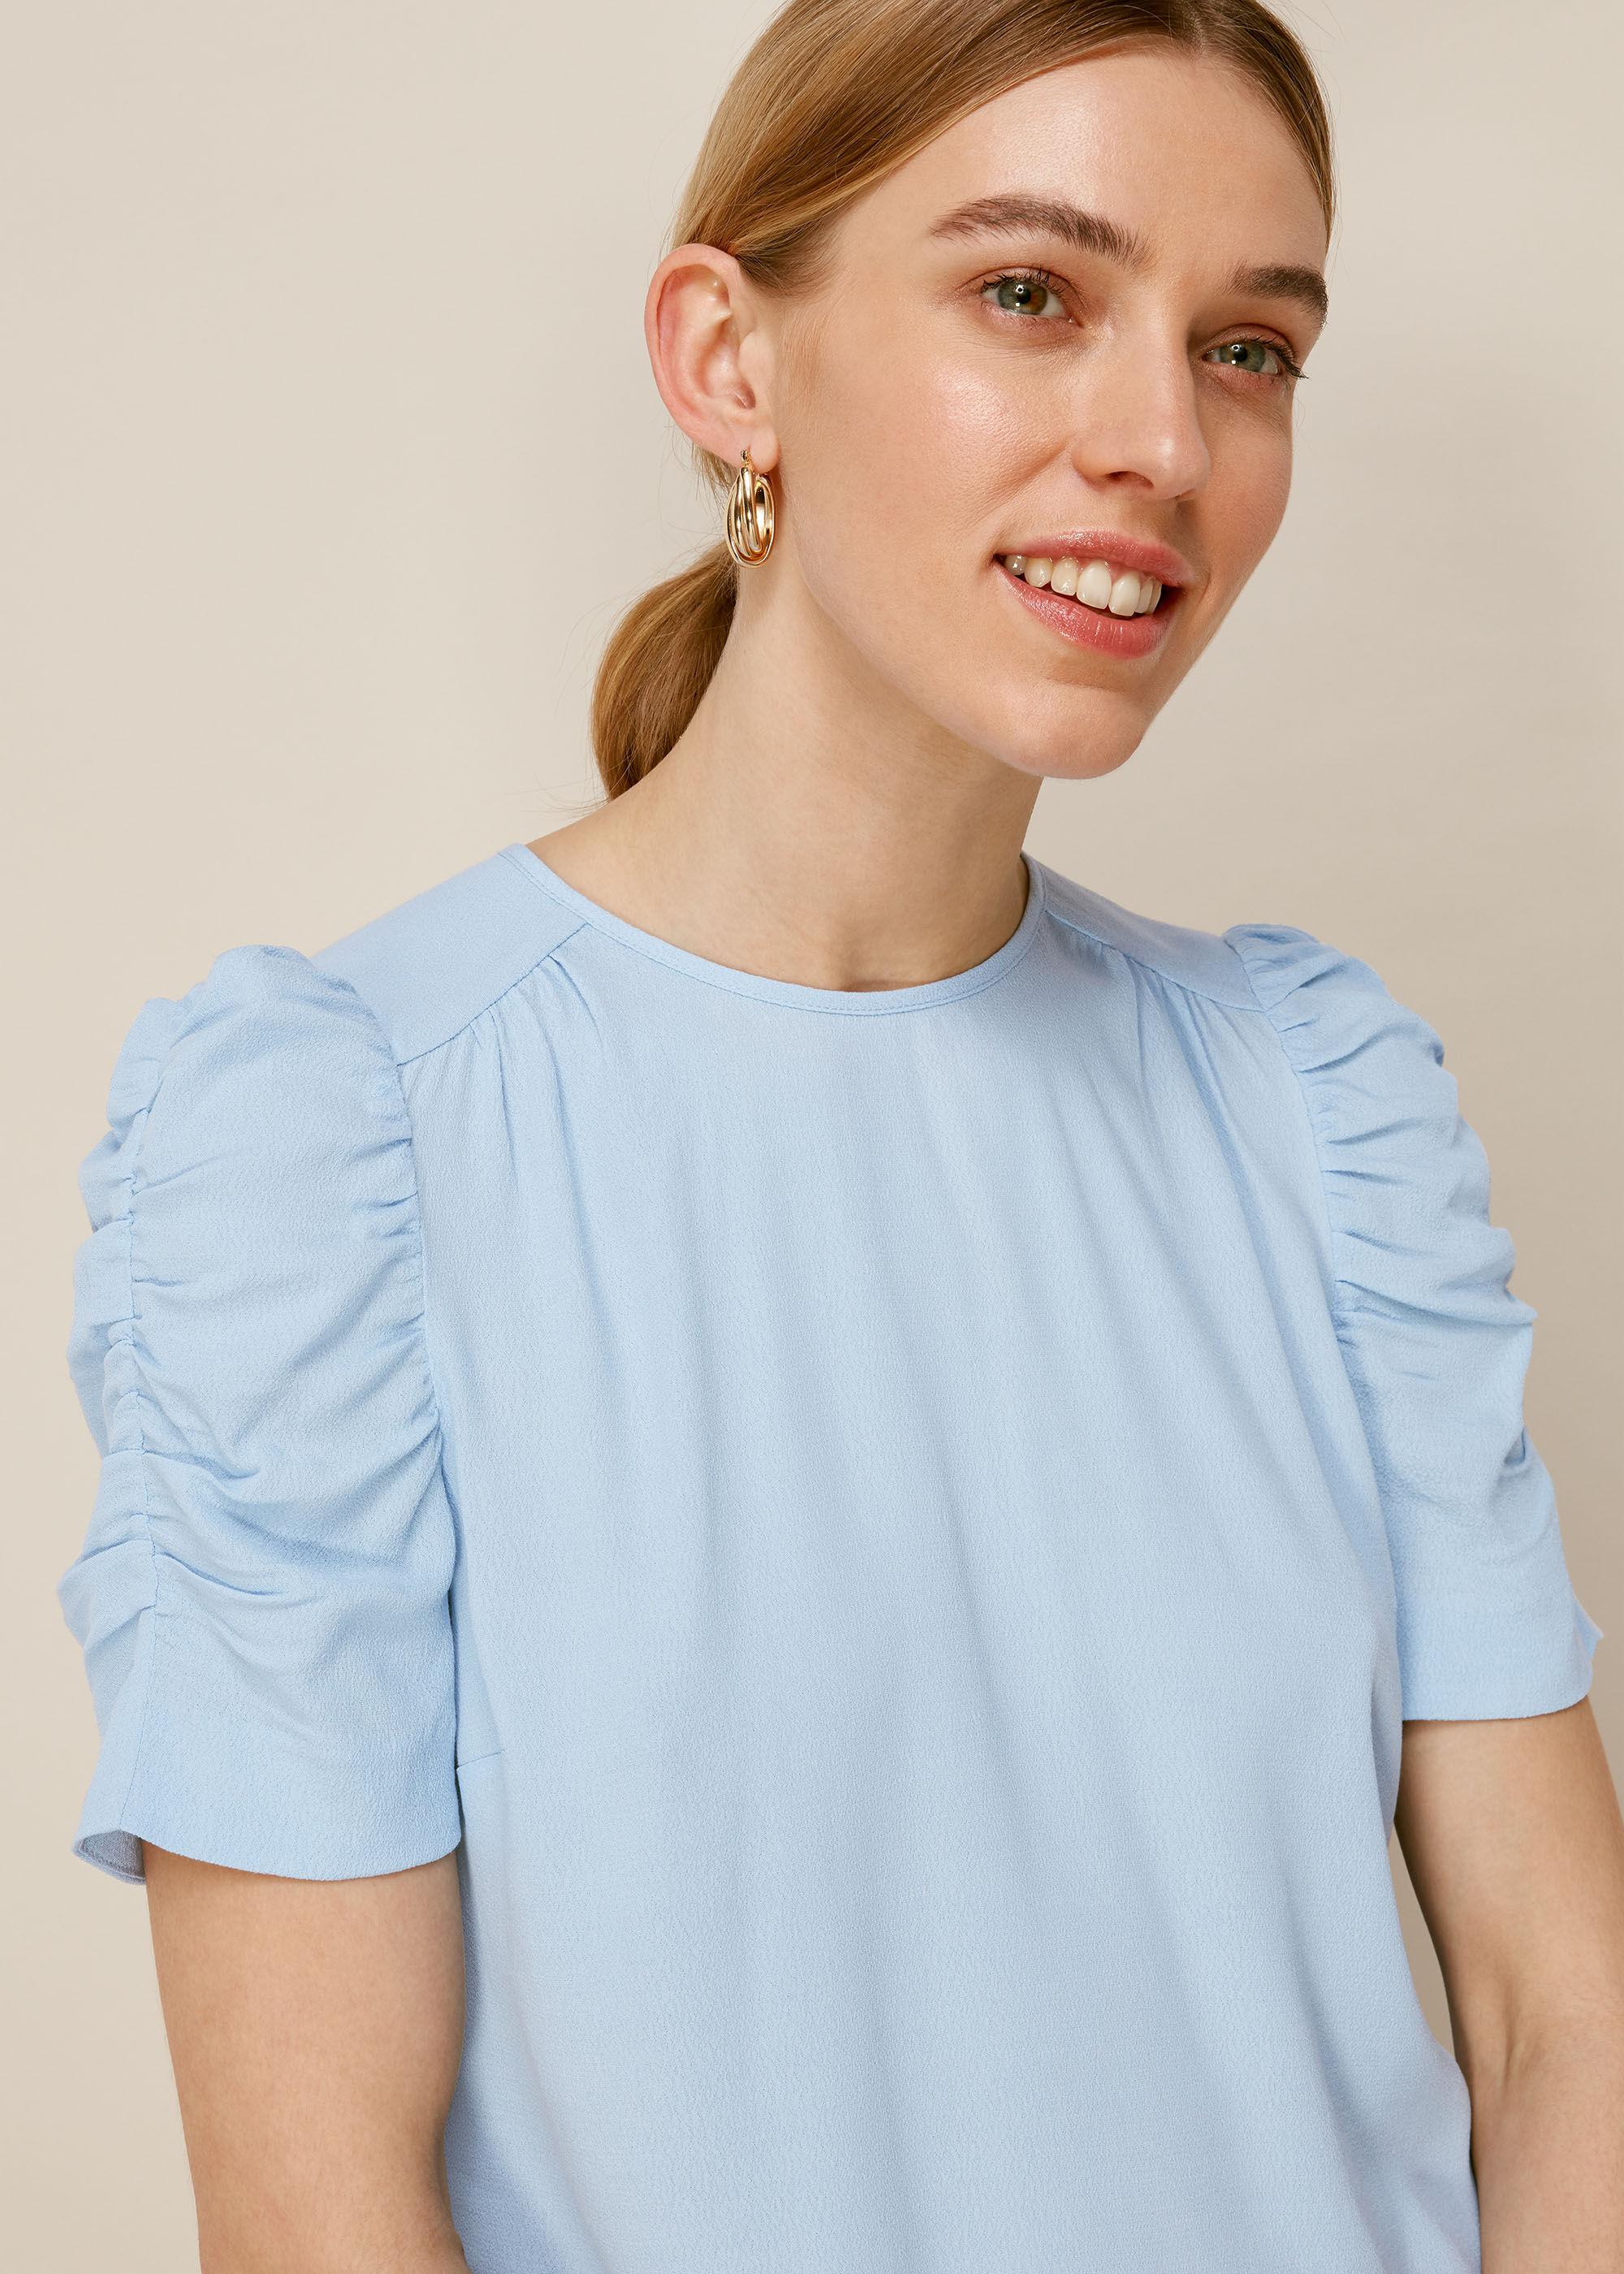 Wolf/&Whistle Frill Top Vest Cobalt or Light Blue Blue Rrp £30 Choose Size